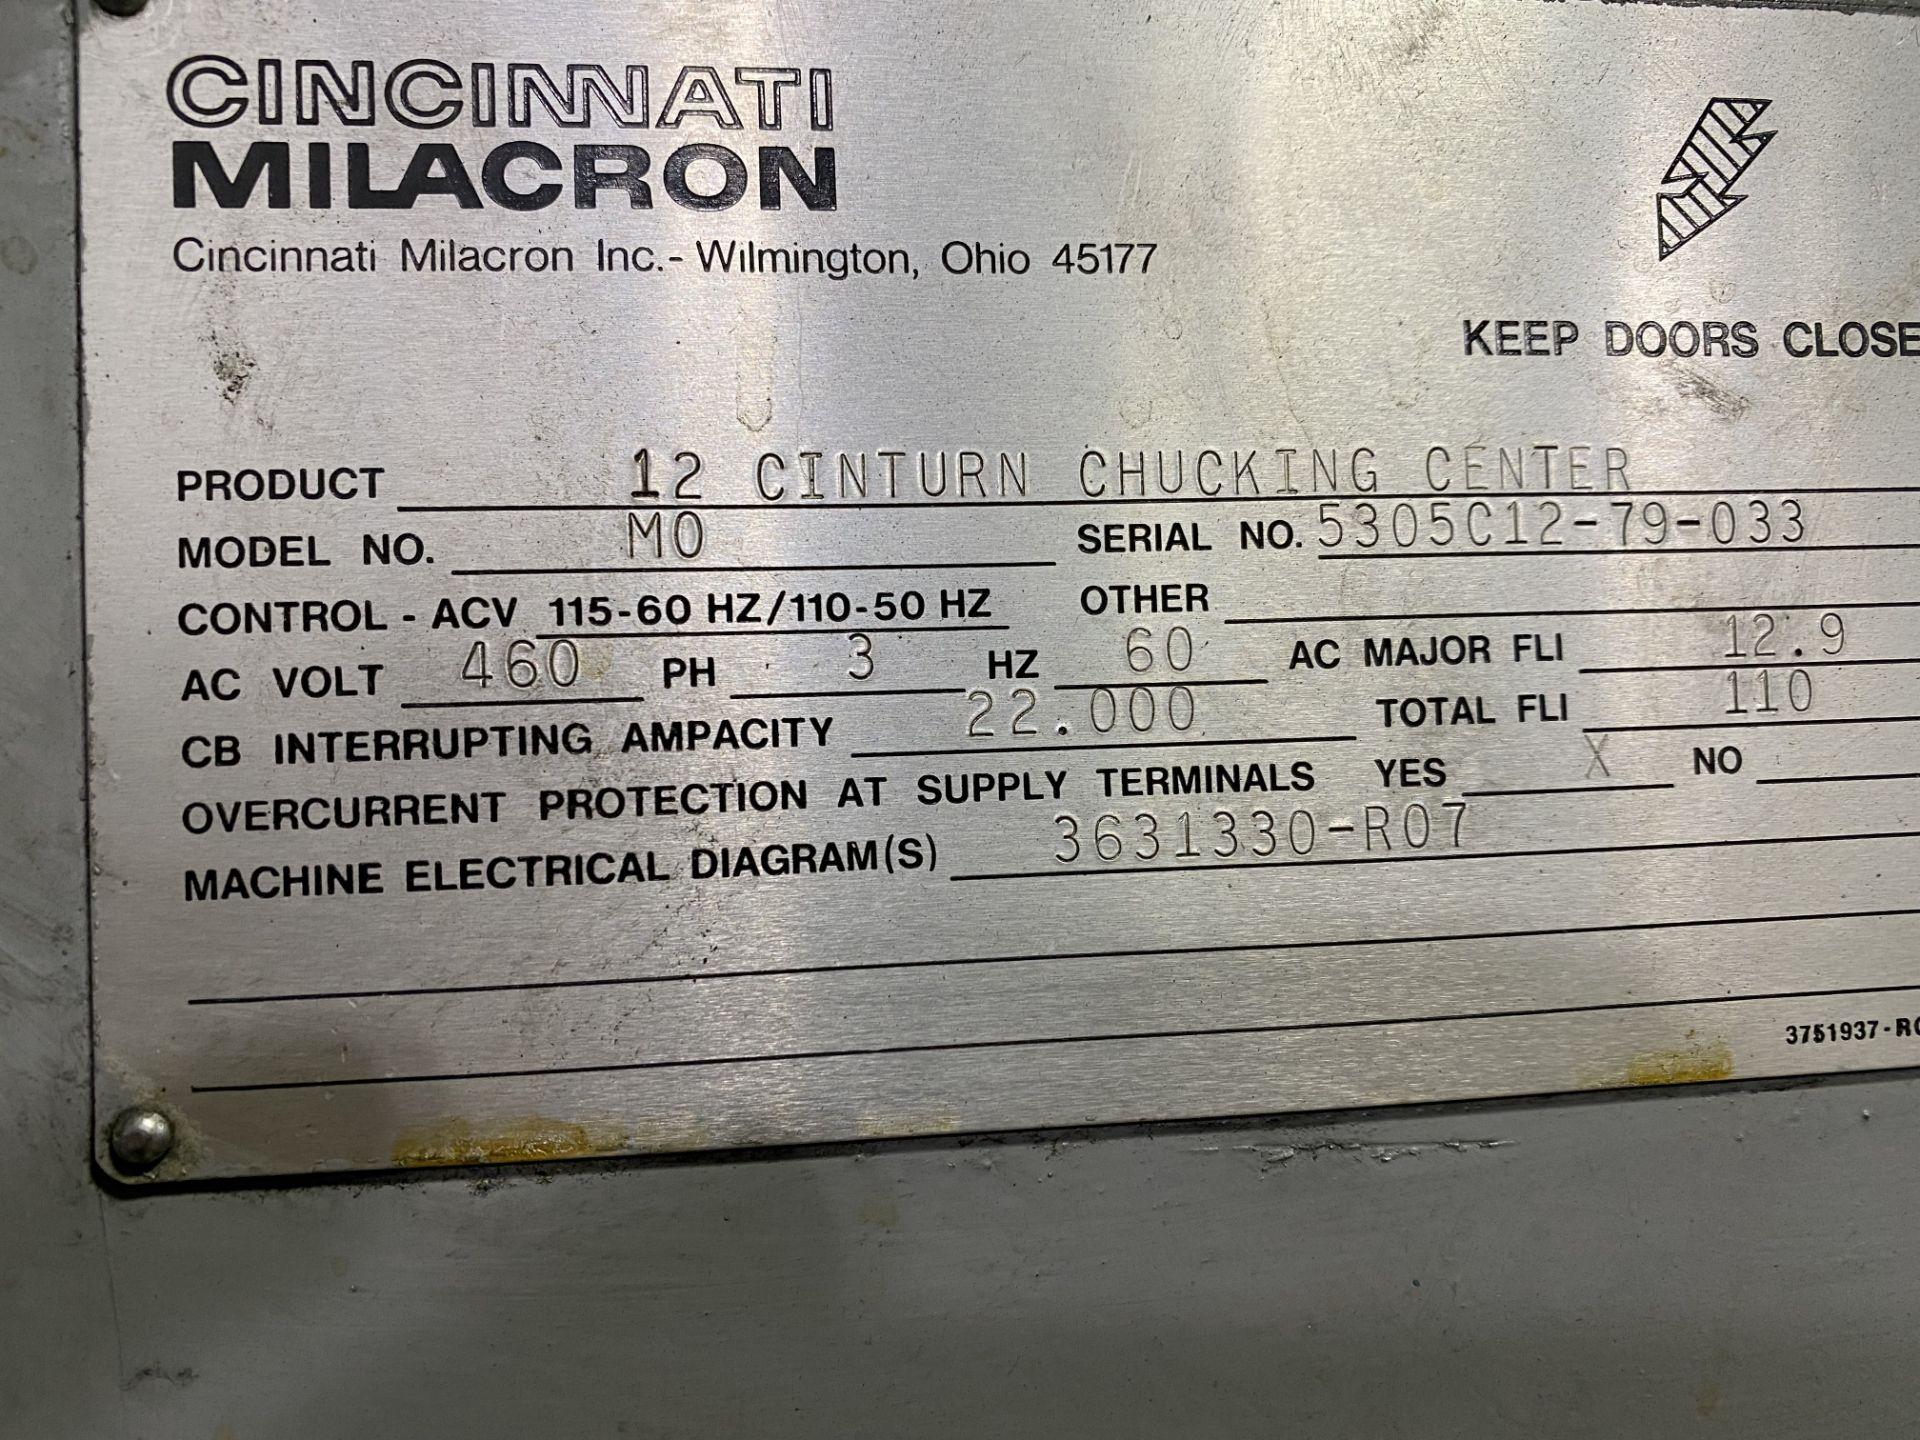 Cincinnati Cinturn 12 CNC Lathe w/ Fanuc Control RETROFIT ***PARTS MACHINE, NO CONTROLLER** - Image 8 of 8